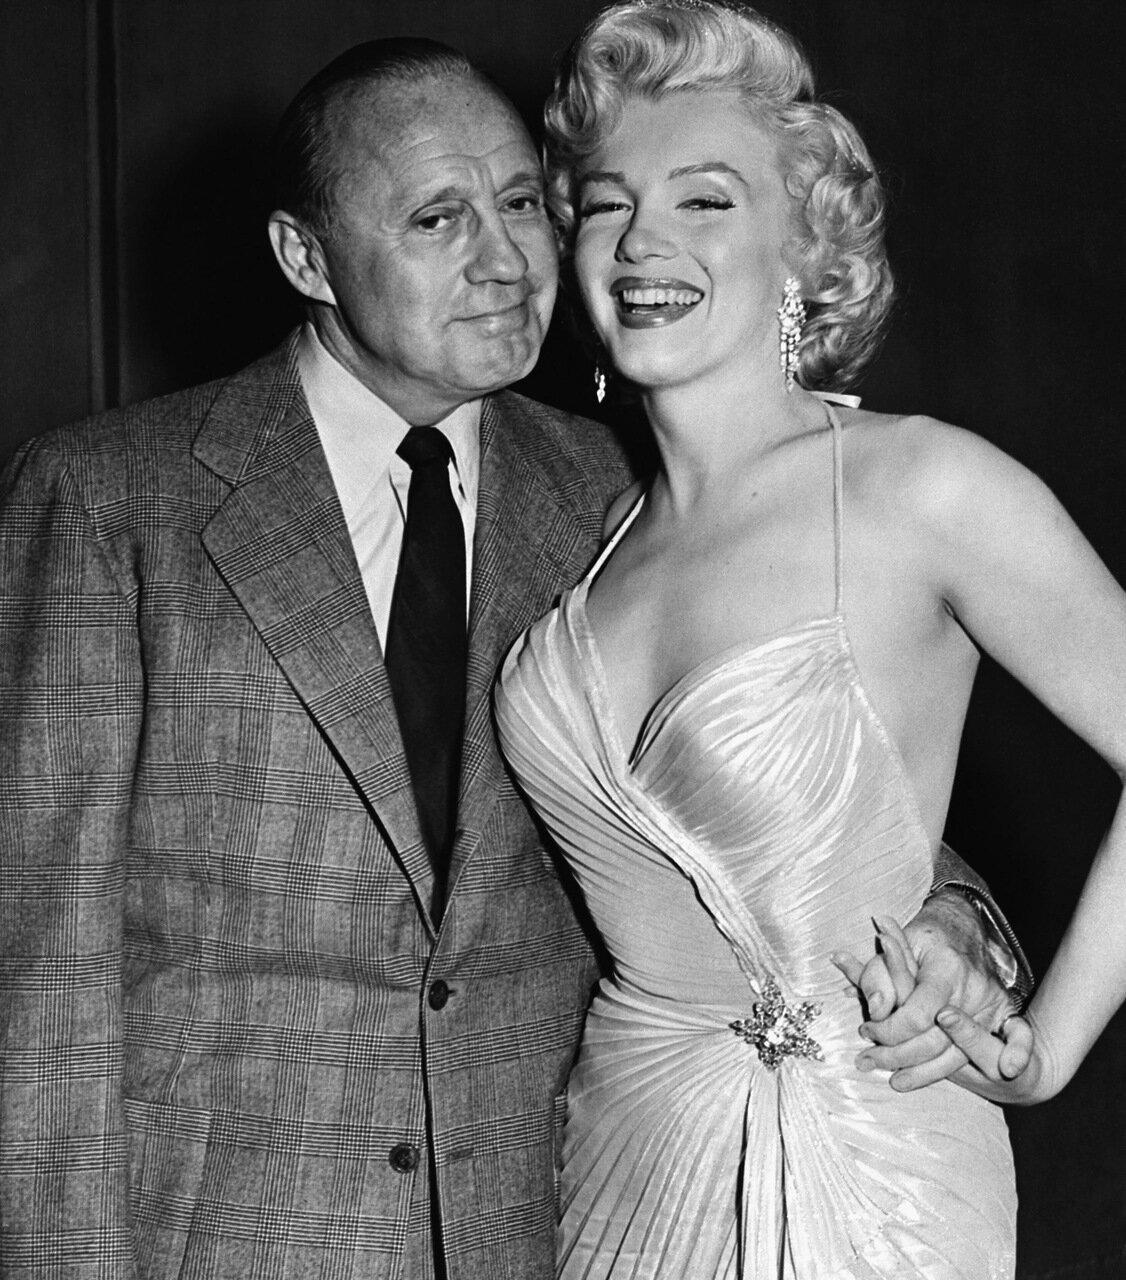 Jack Benny and Marilyn Monroe